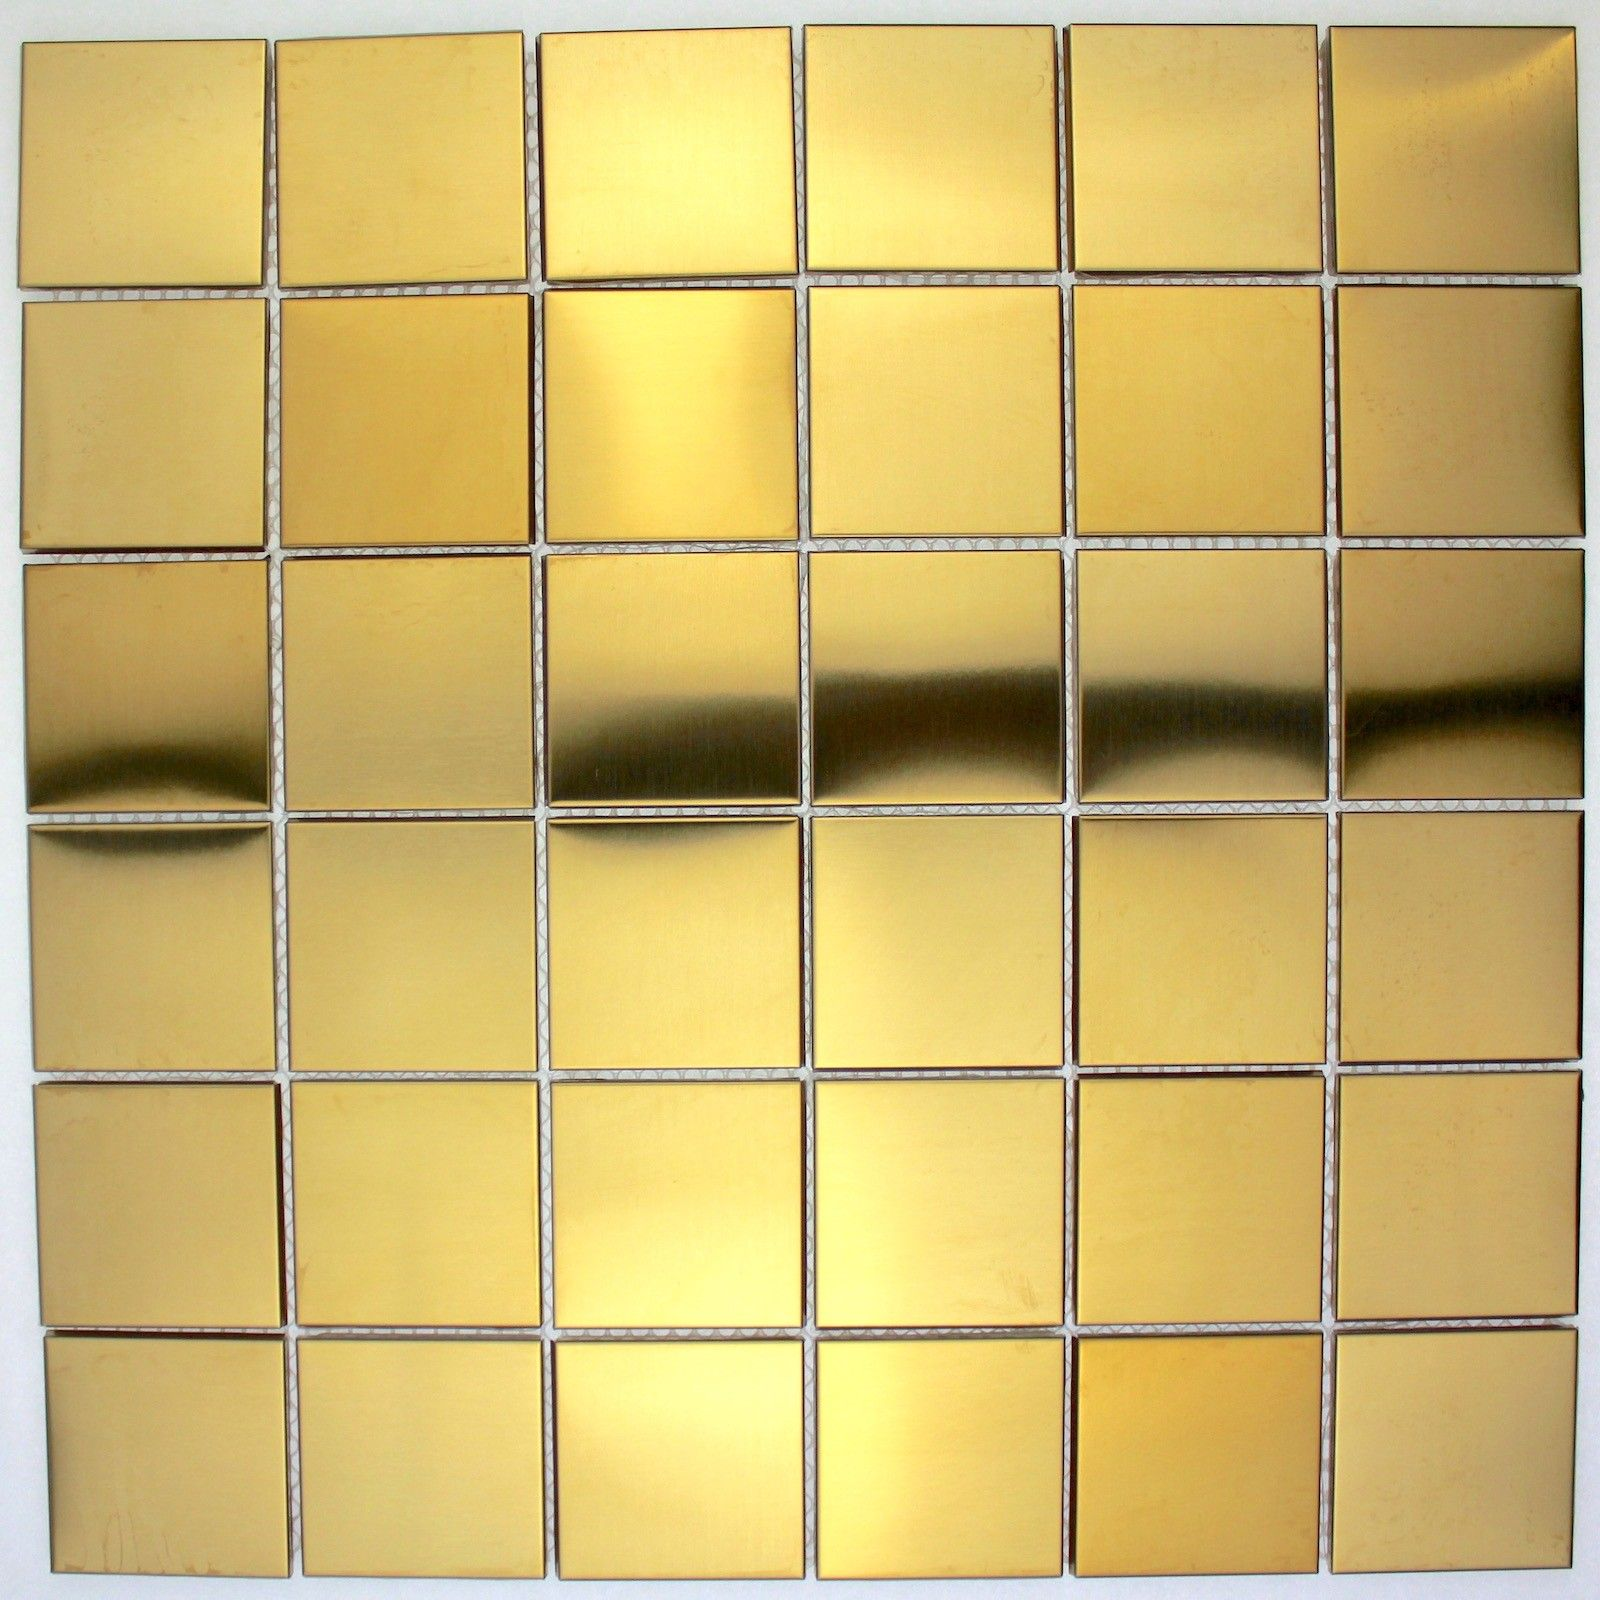 - Stainless Steel Tiles Kitchen Backsplash Mi-reg48-g Carrelage